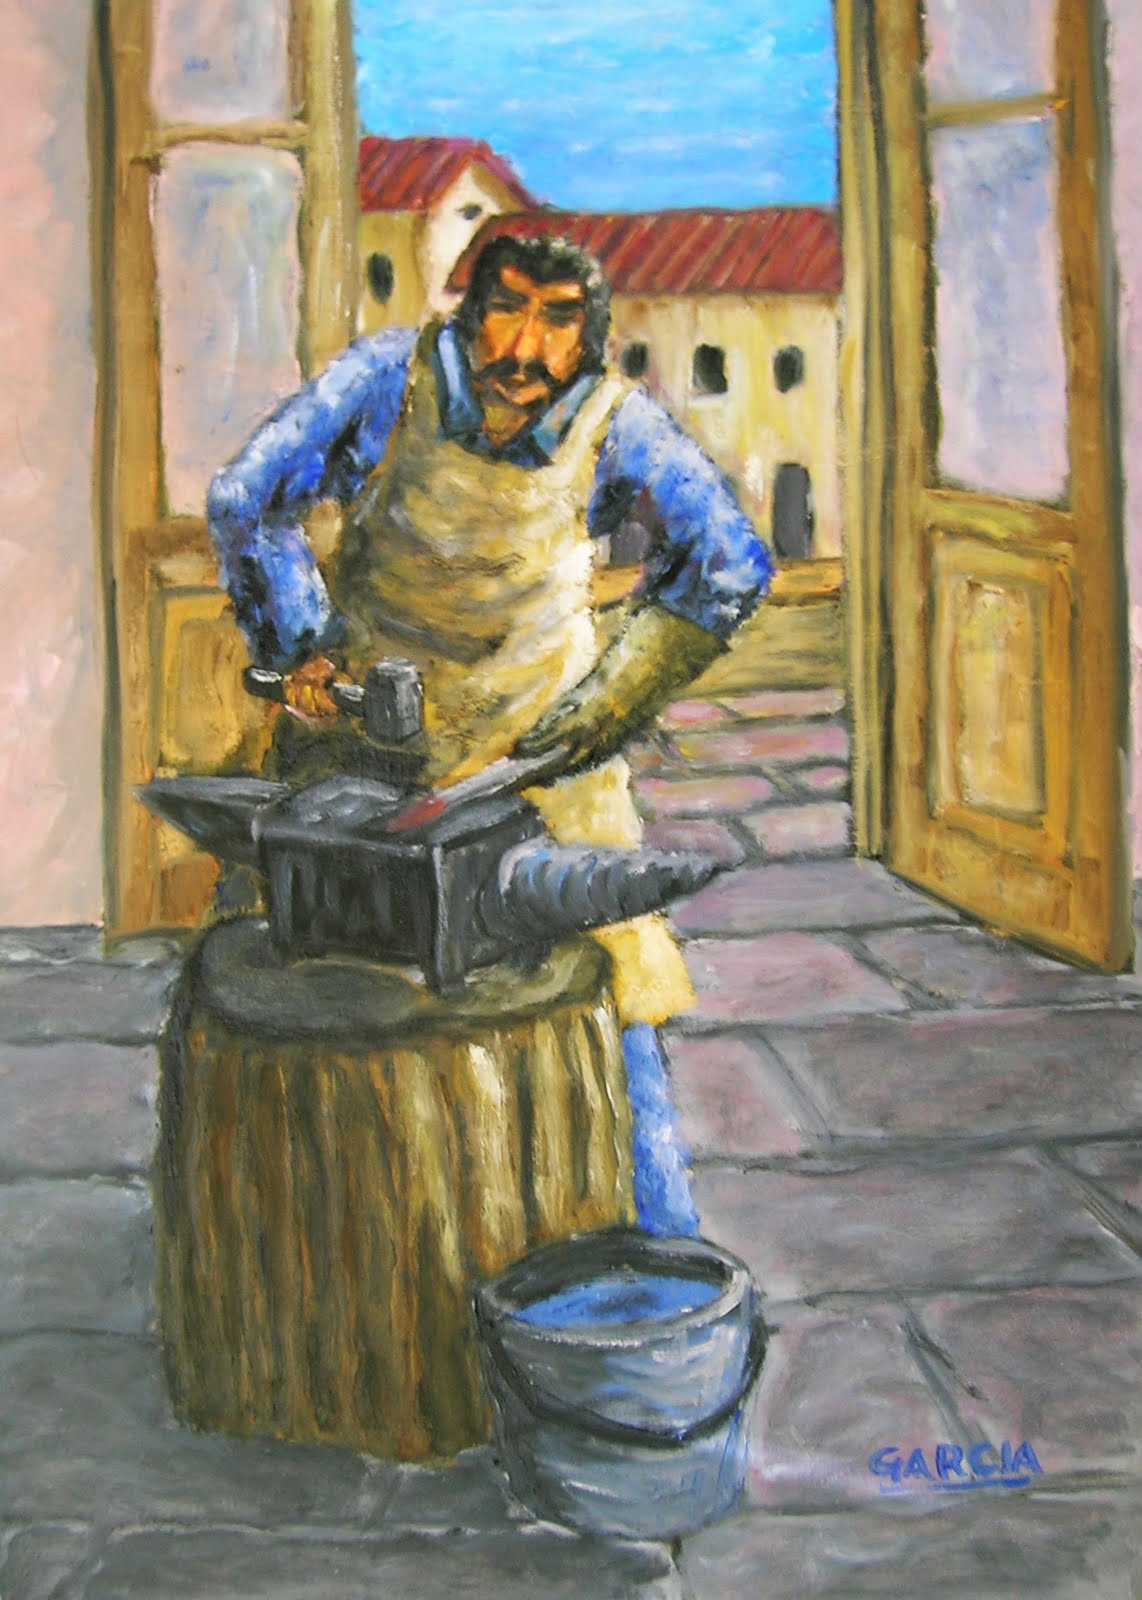 gabriela garcia pinturas